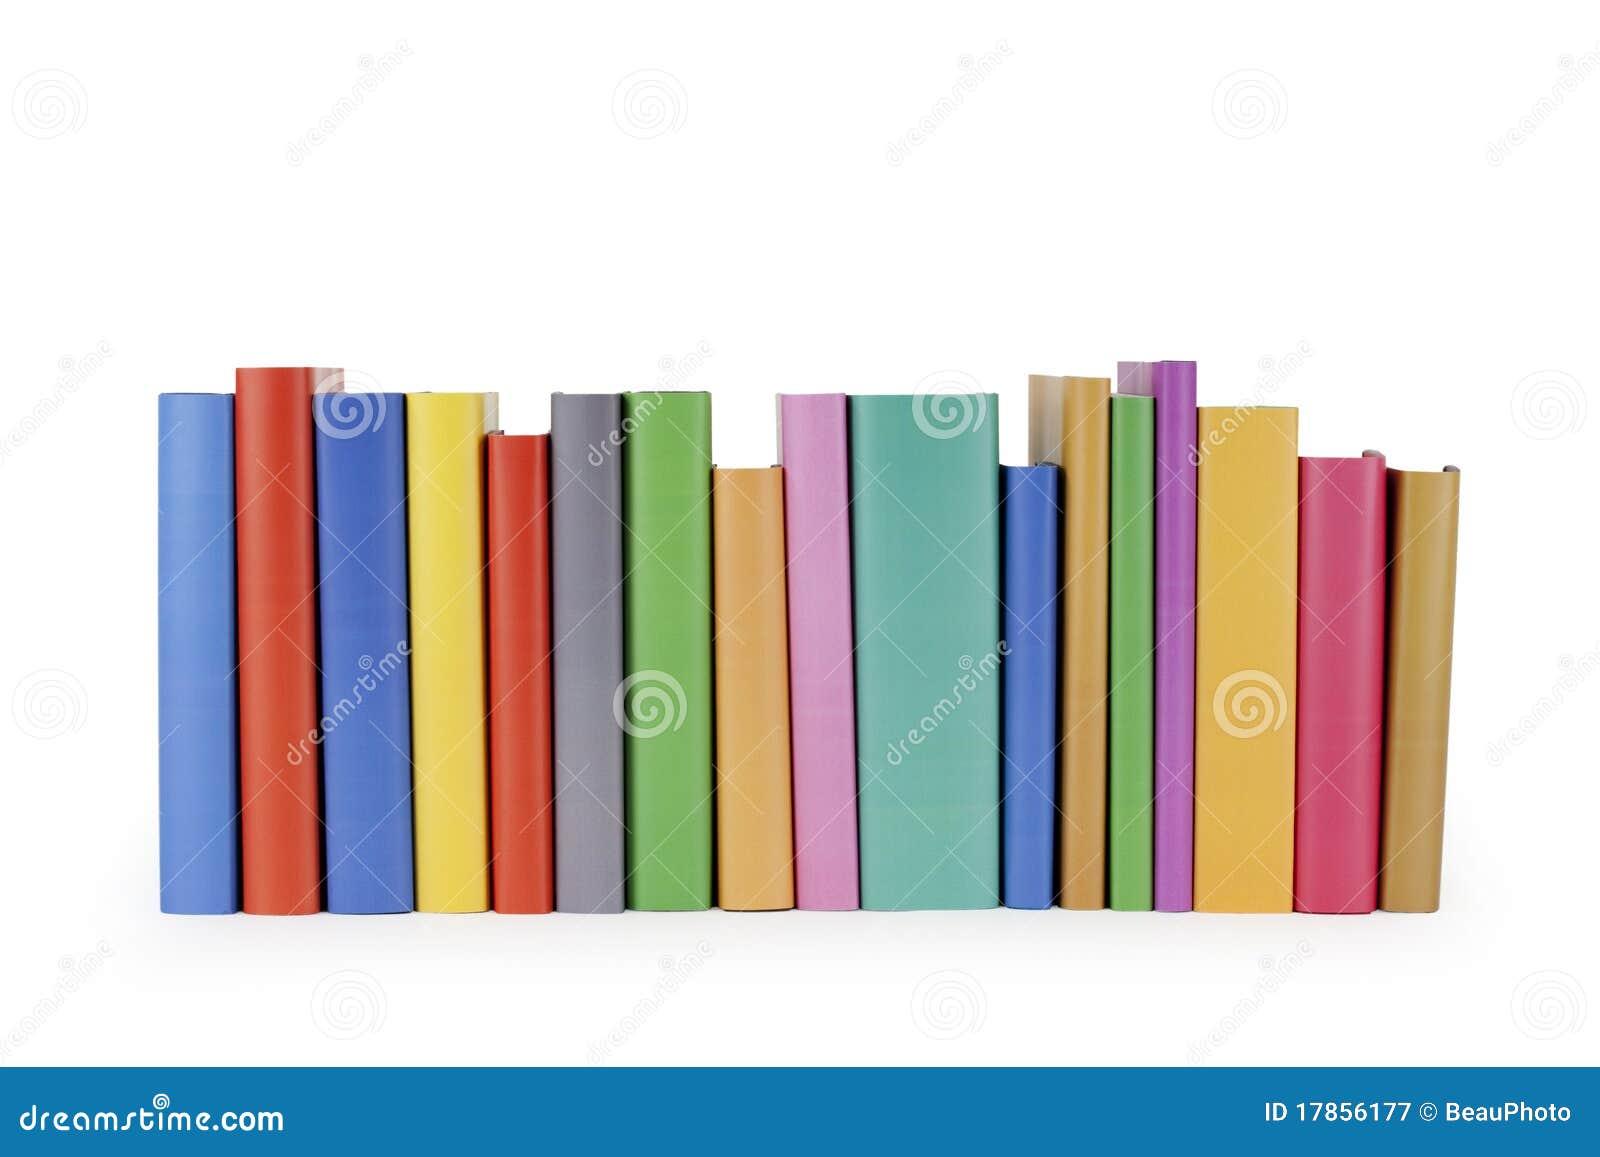 Ligne des livres